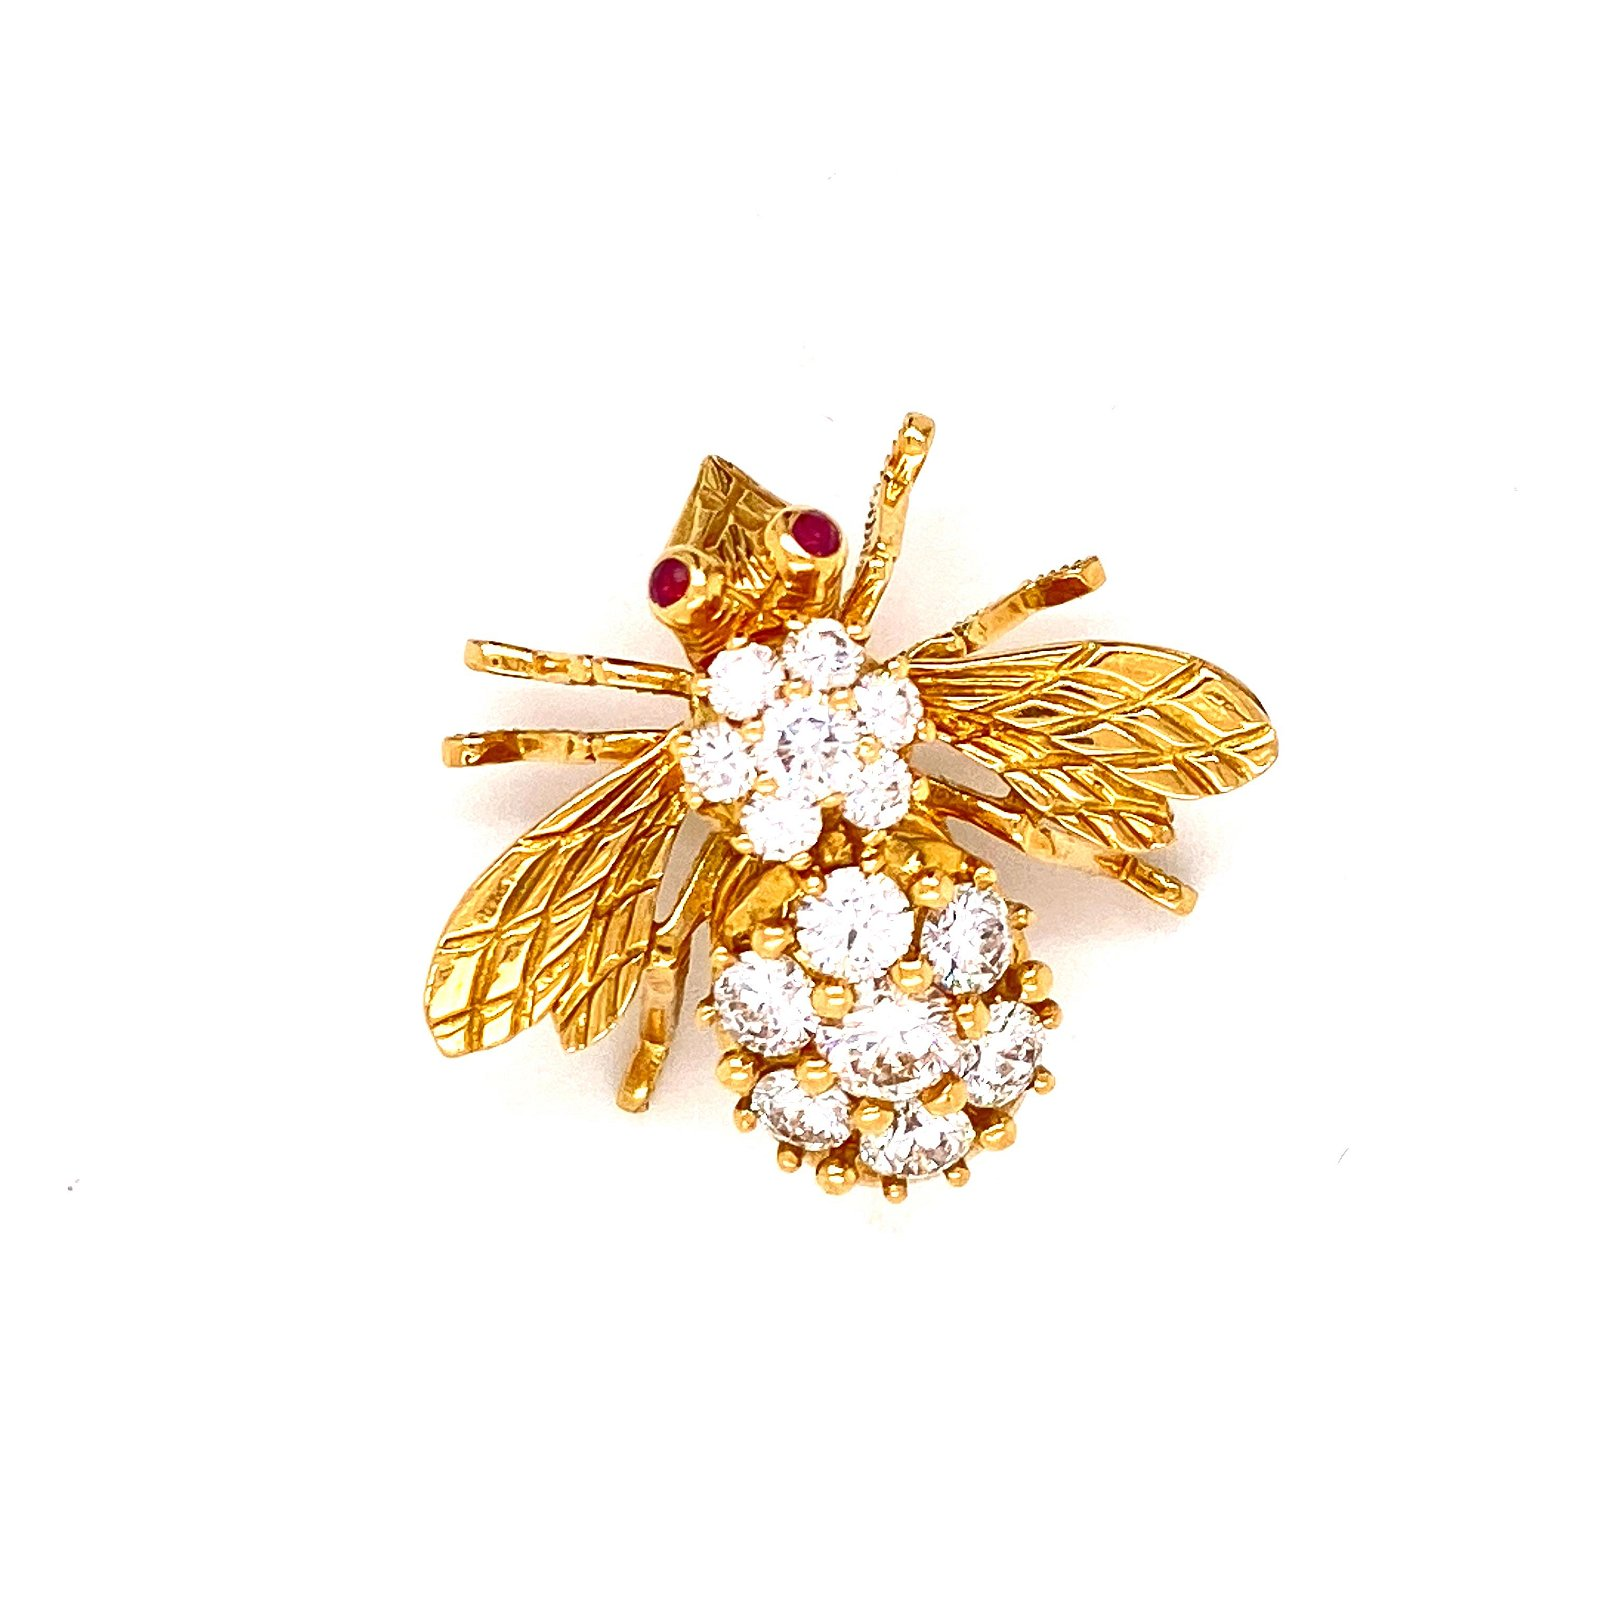 18K Gold, Diamonds & Rubies Bee Pendant